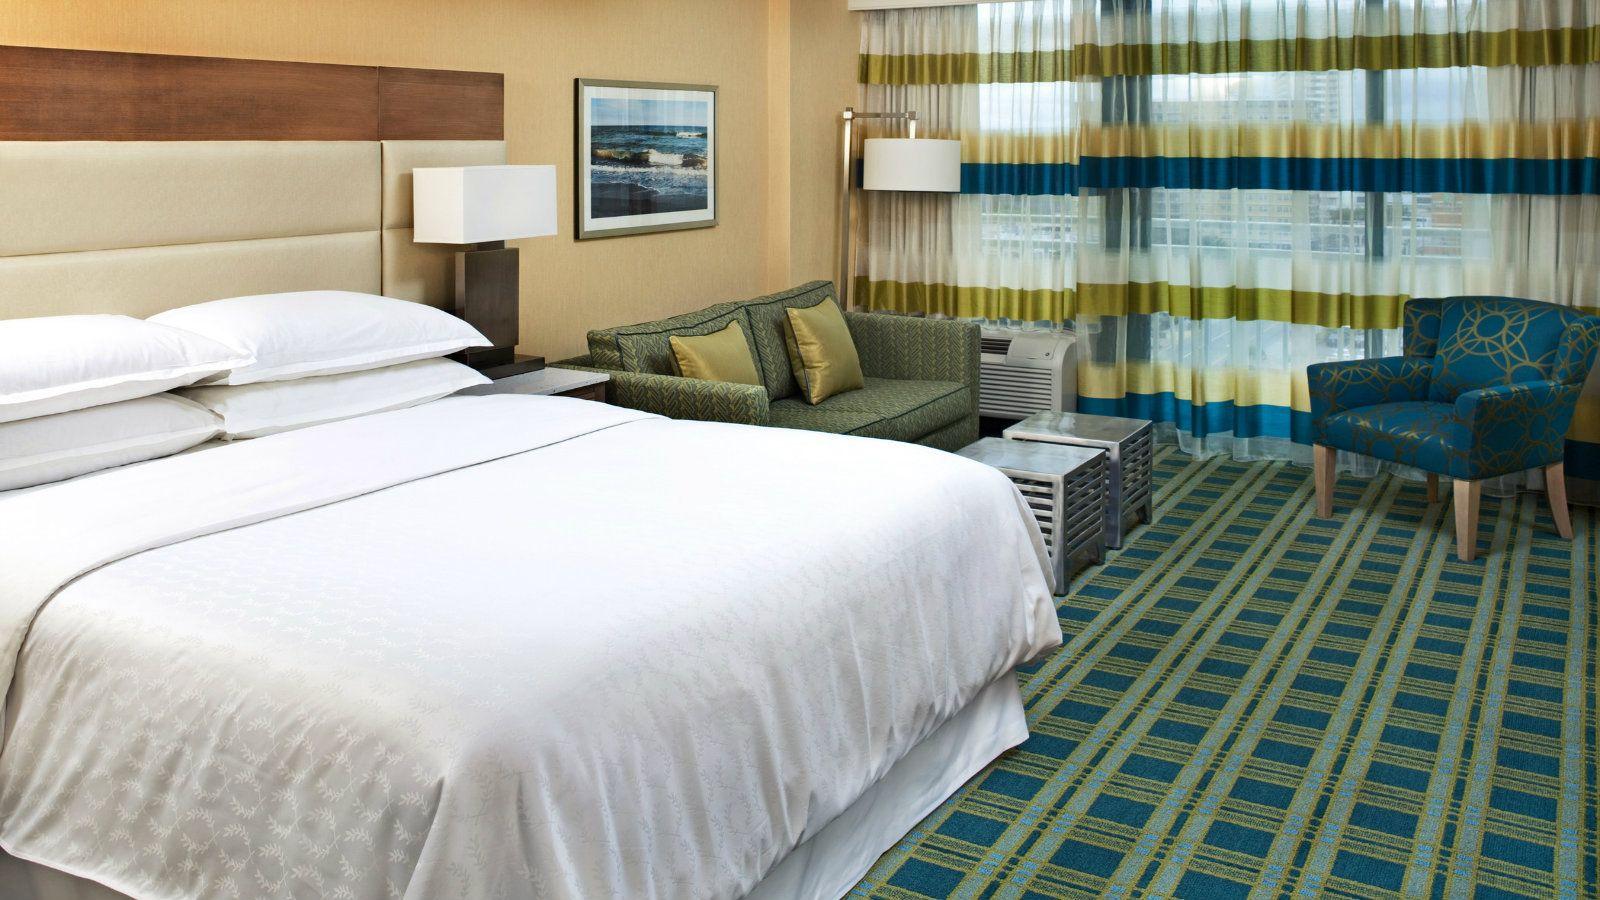 Jacuzzi Room Sheraton Virginia Beach Oceanfront Hotel Virginia Beach Oceanfront Virginia Beach Oceanfront Hotels Virginia Beach Hotels